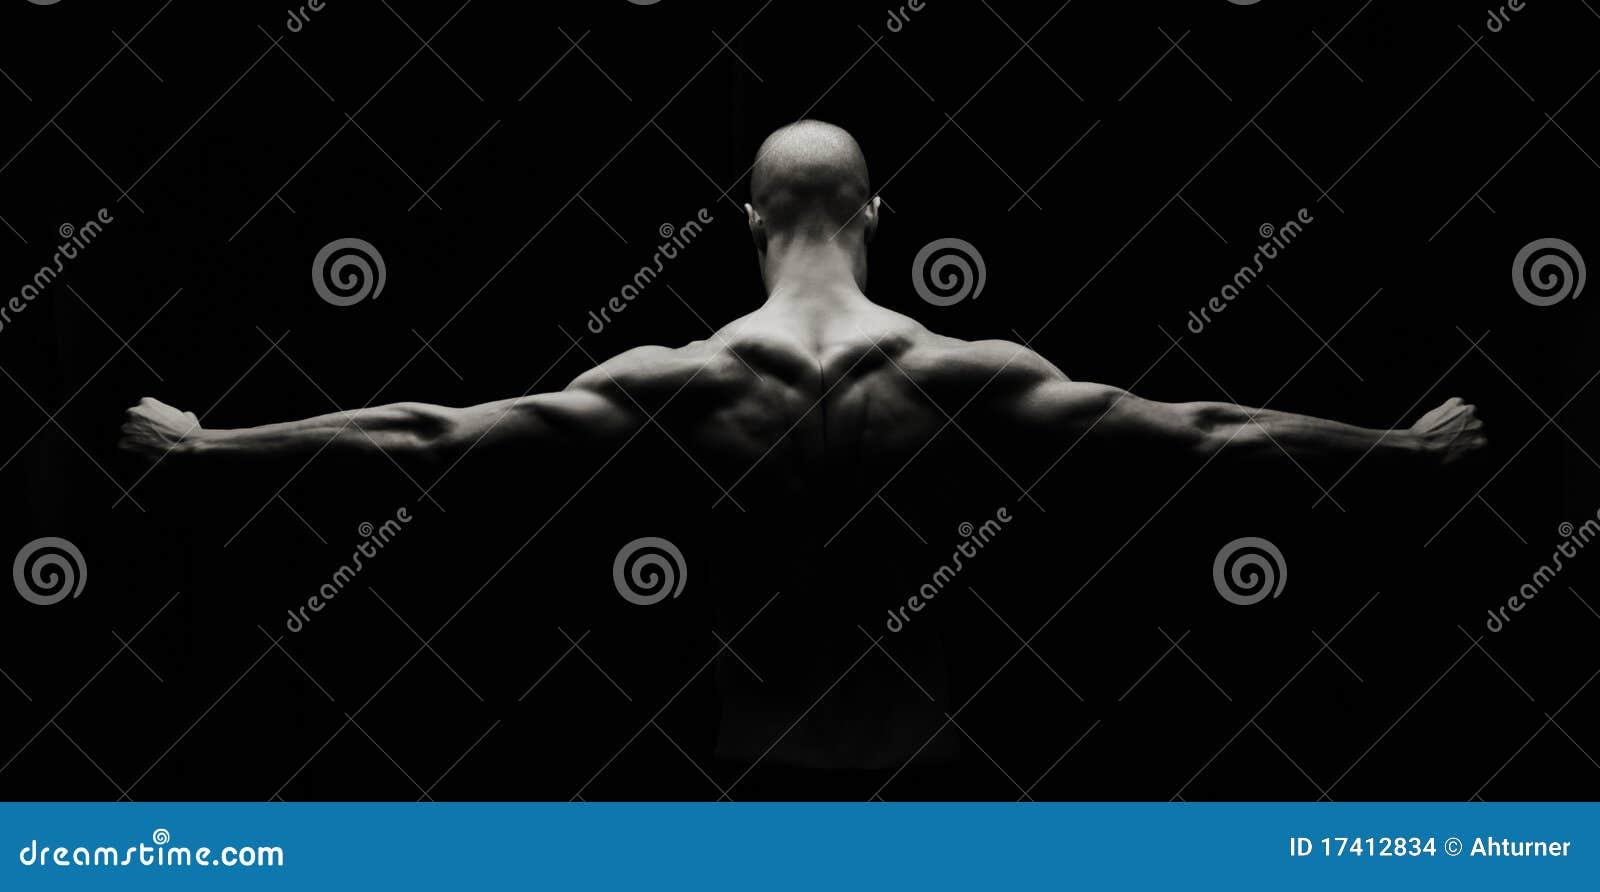 Artistic Fitness